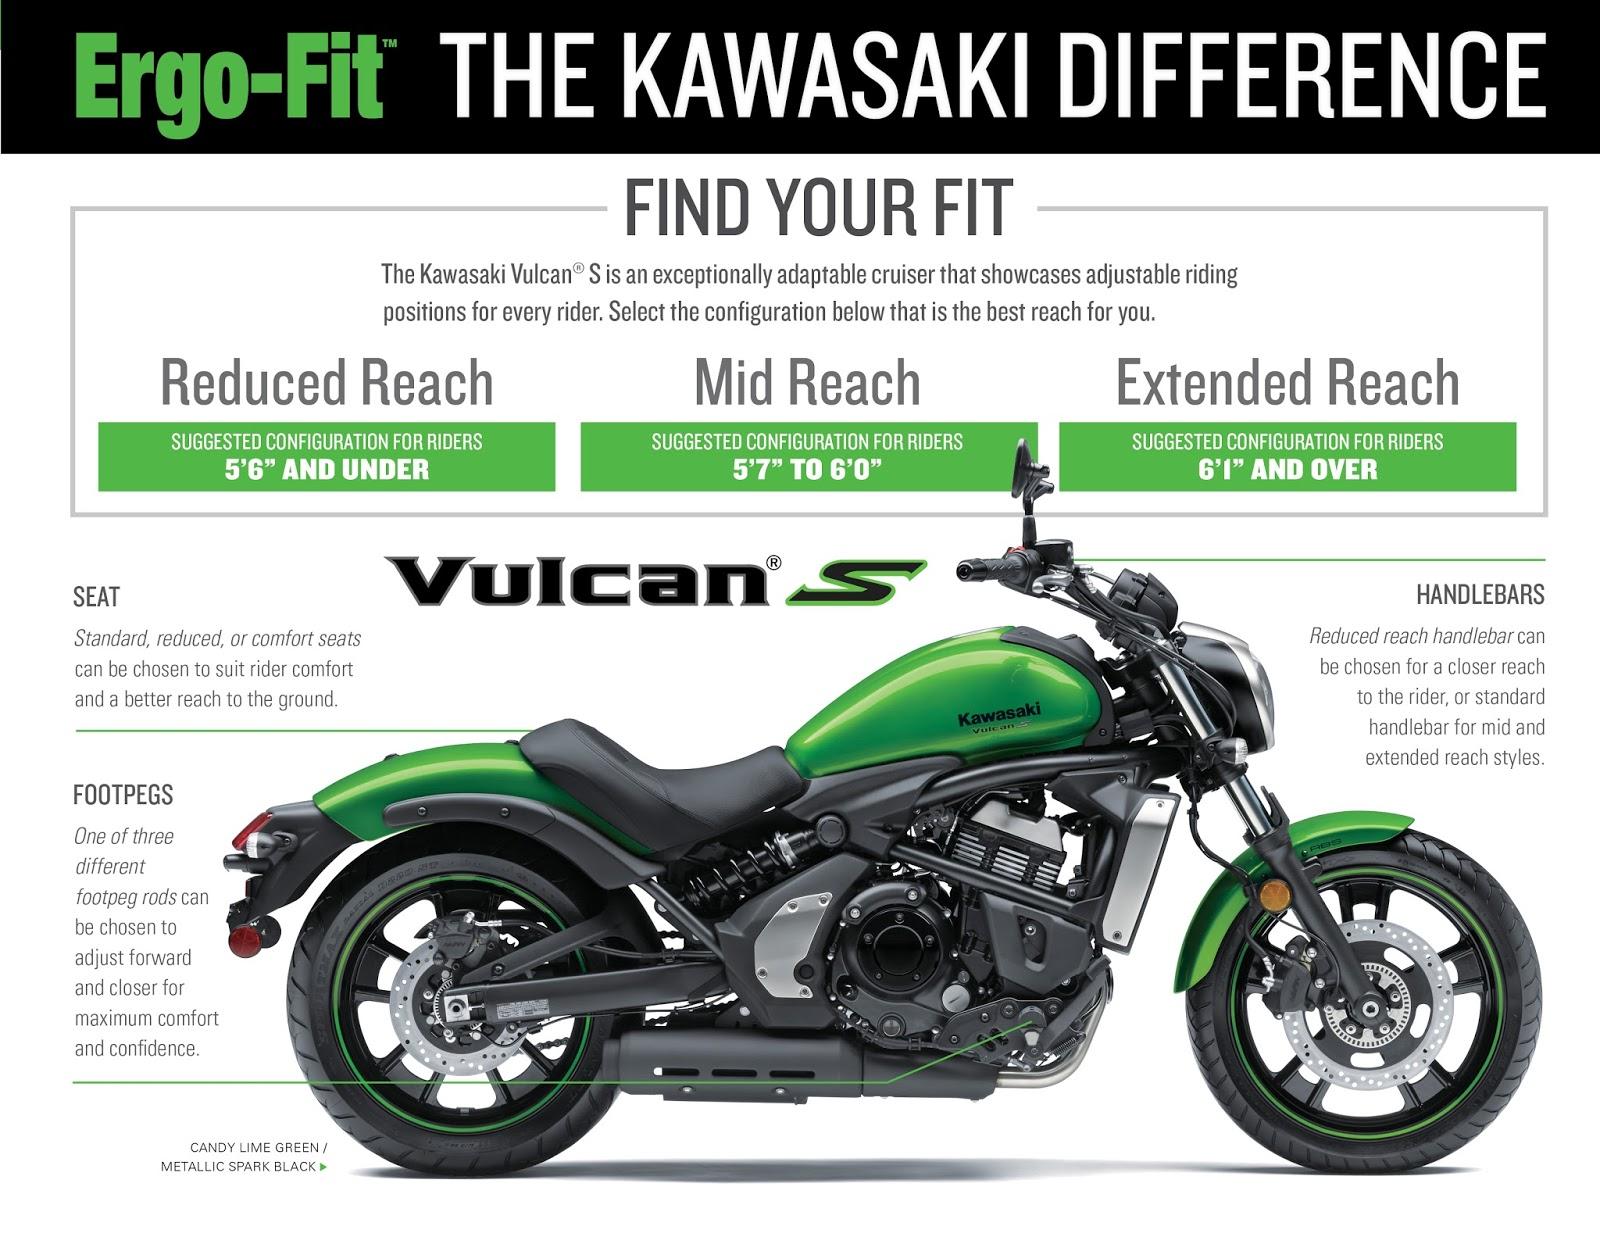 Clutch Cover Emblem From Kawasaki Vulcan S Genuine Accessories